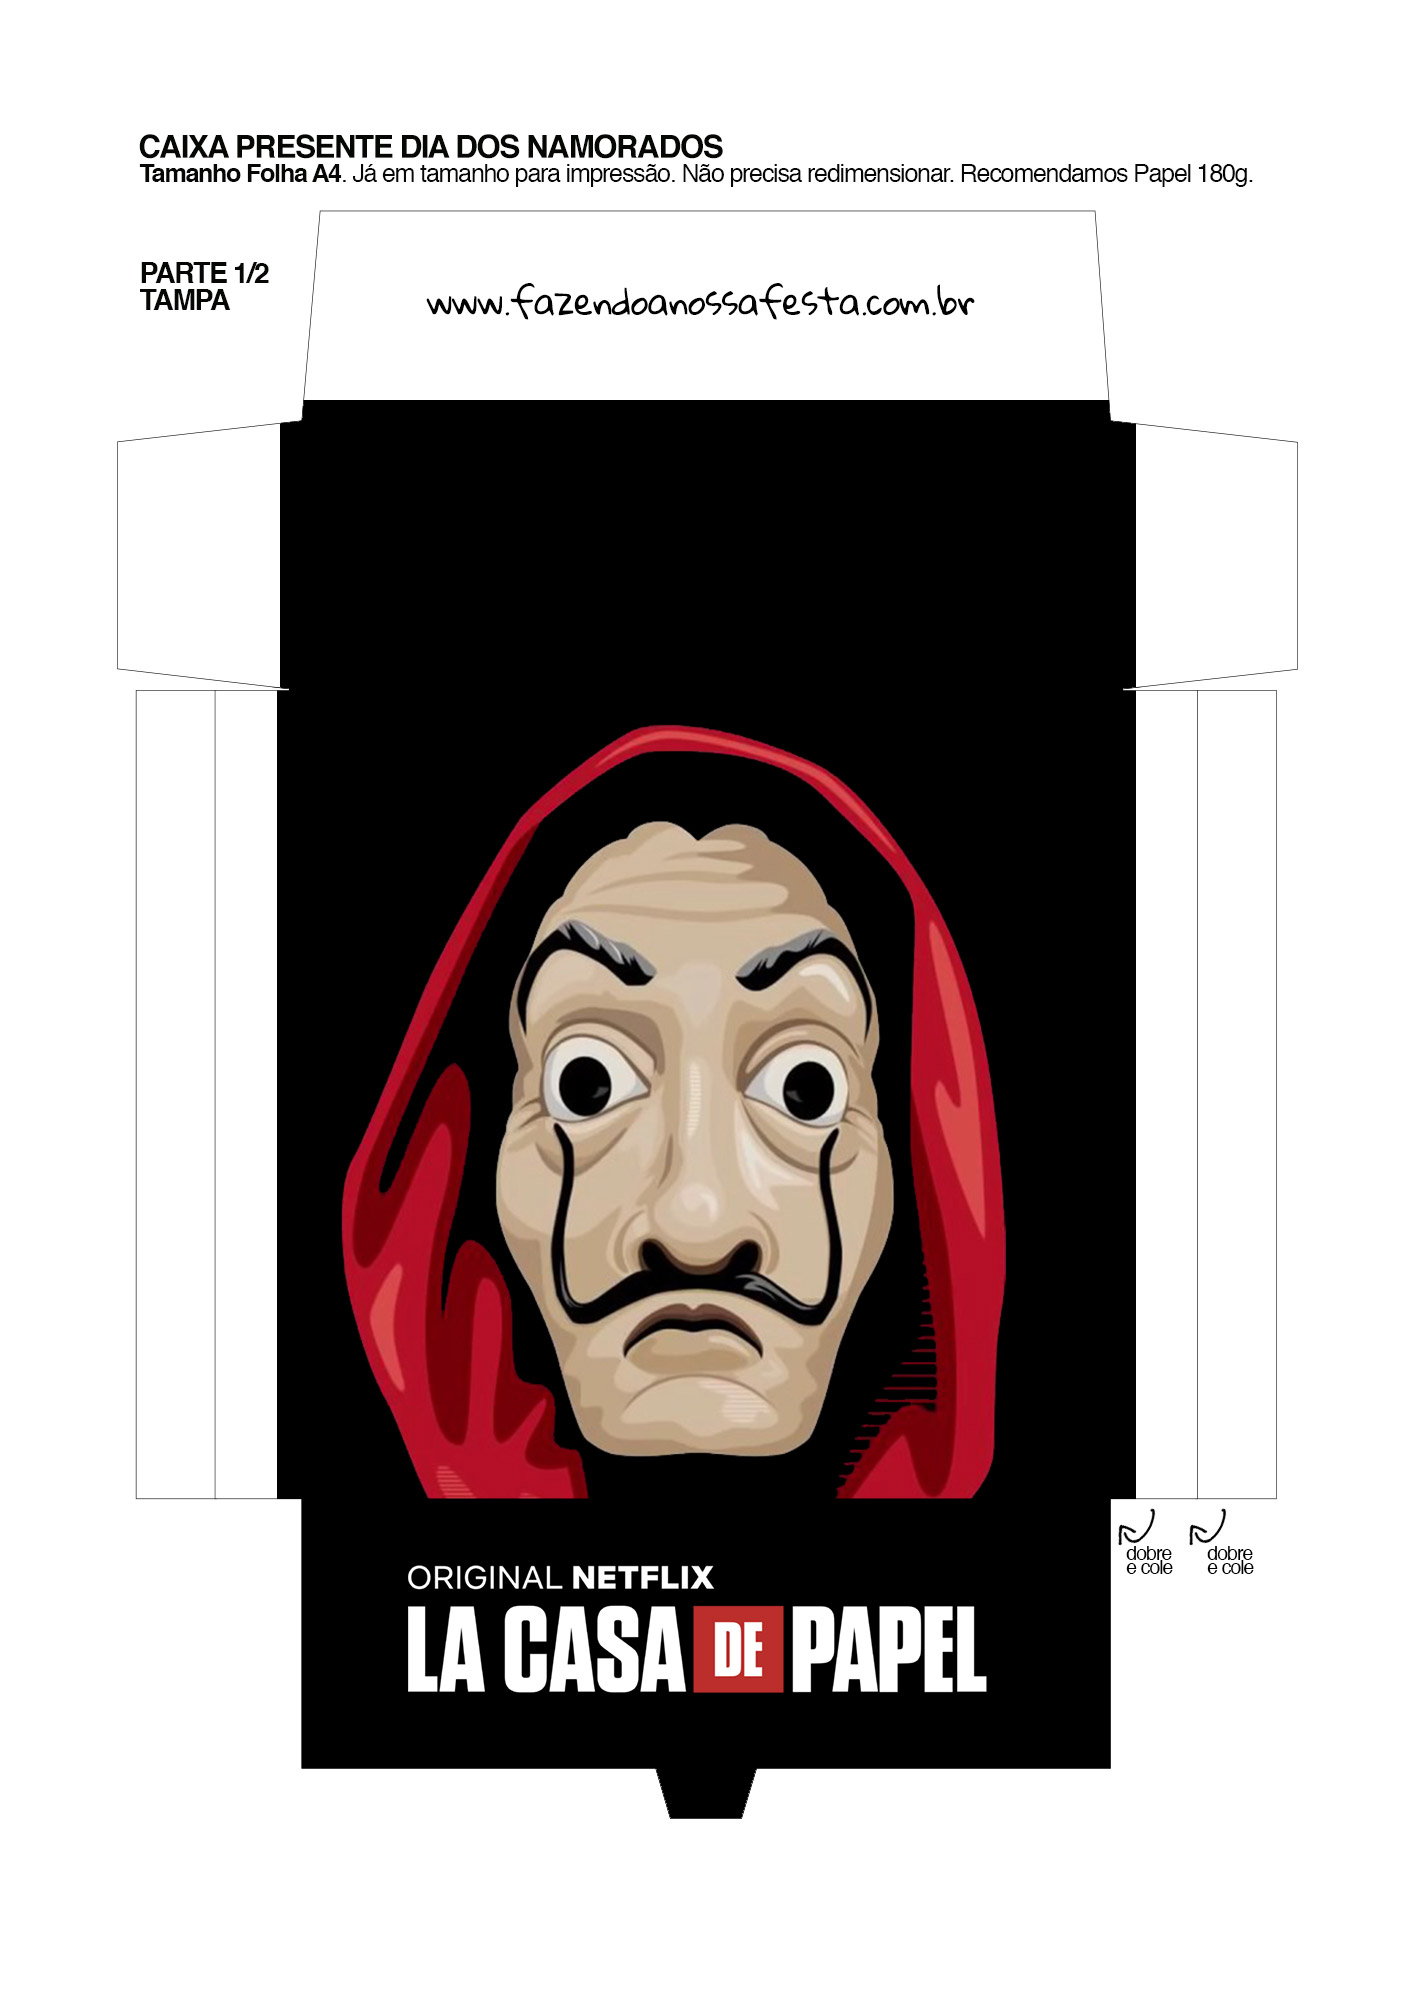 Caixa Brigadeiro La Casa de Papel la casa de papel 1_01